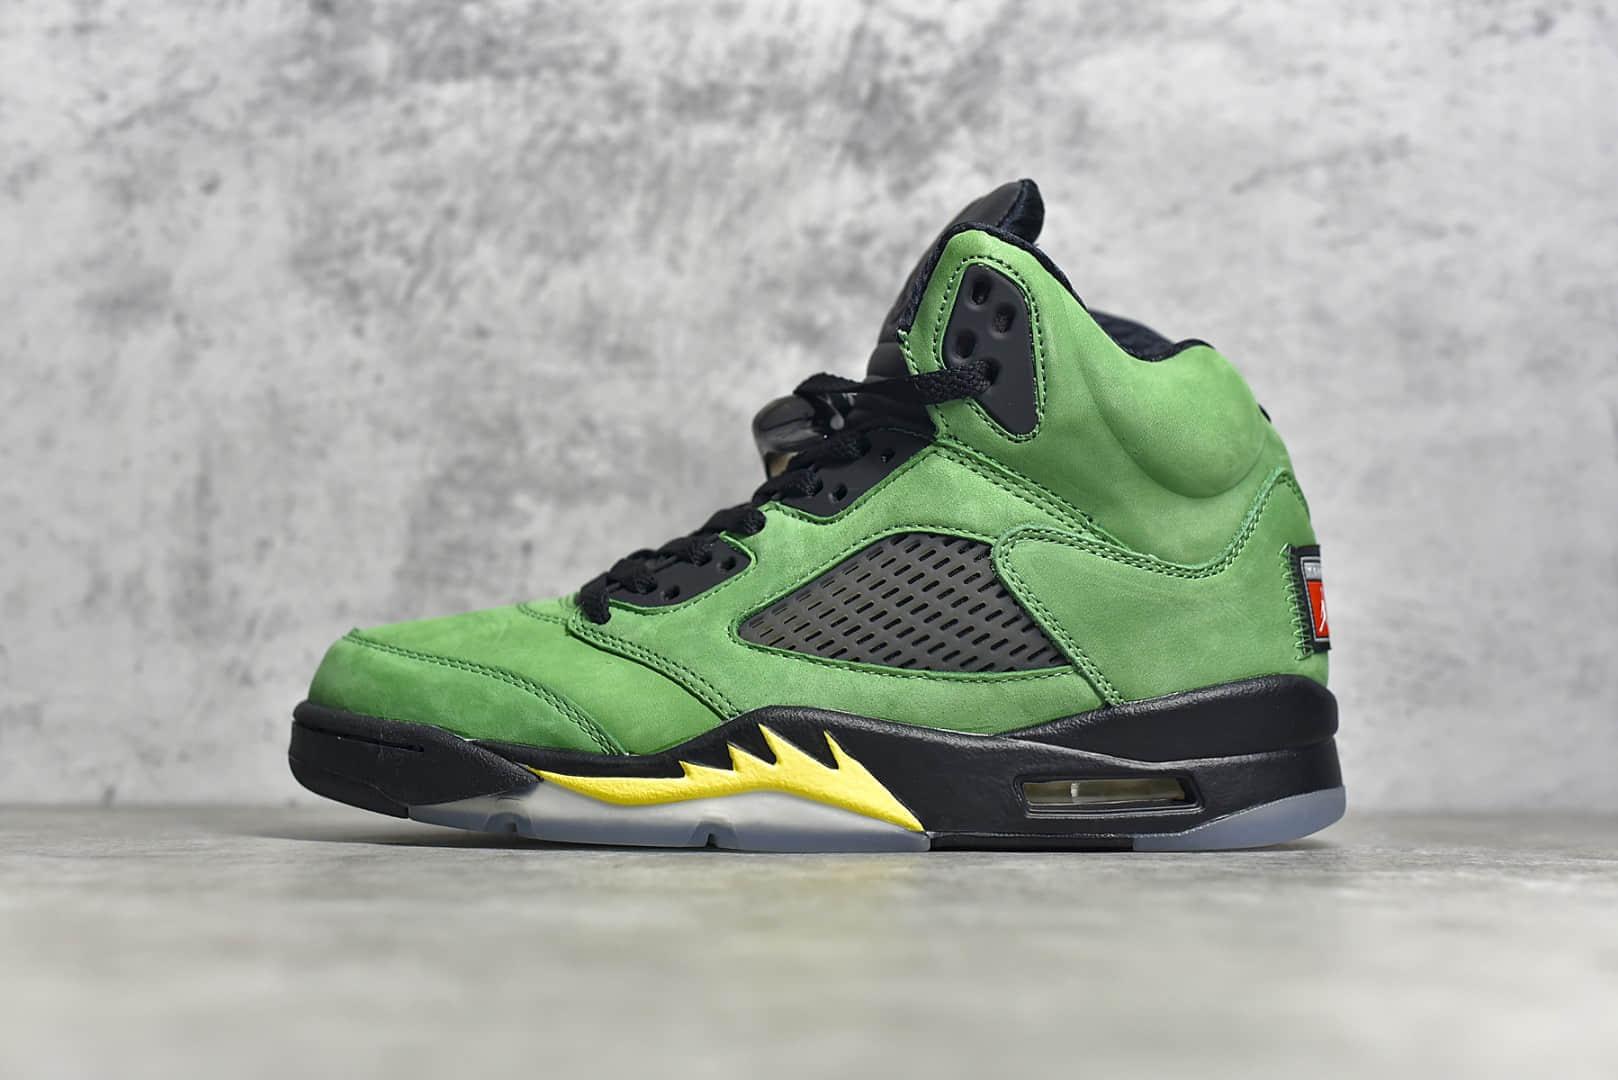 AJ5黑绿俄勒冈大学高帮实战篮球鞋 Air Jordan 5 Retro SE Apple Green 东莞莞产顶级版本AJ5系列 货号:CK6631-307-潮流者之家